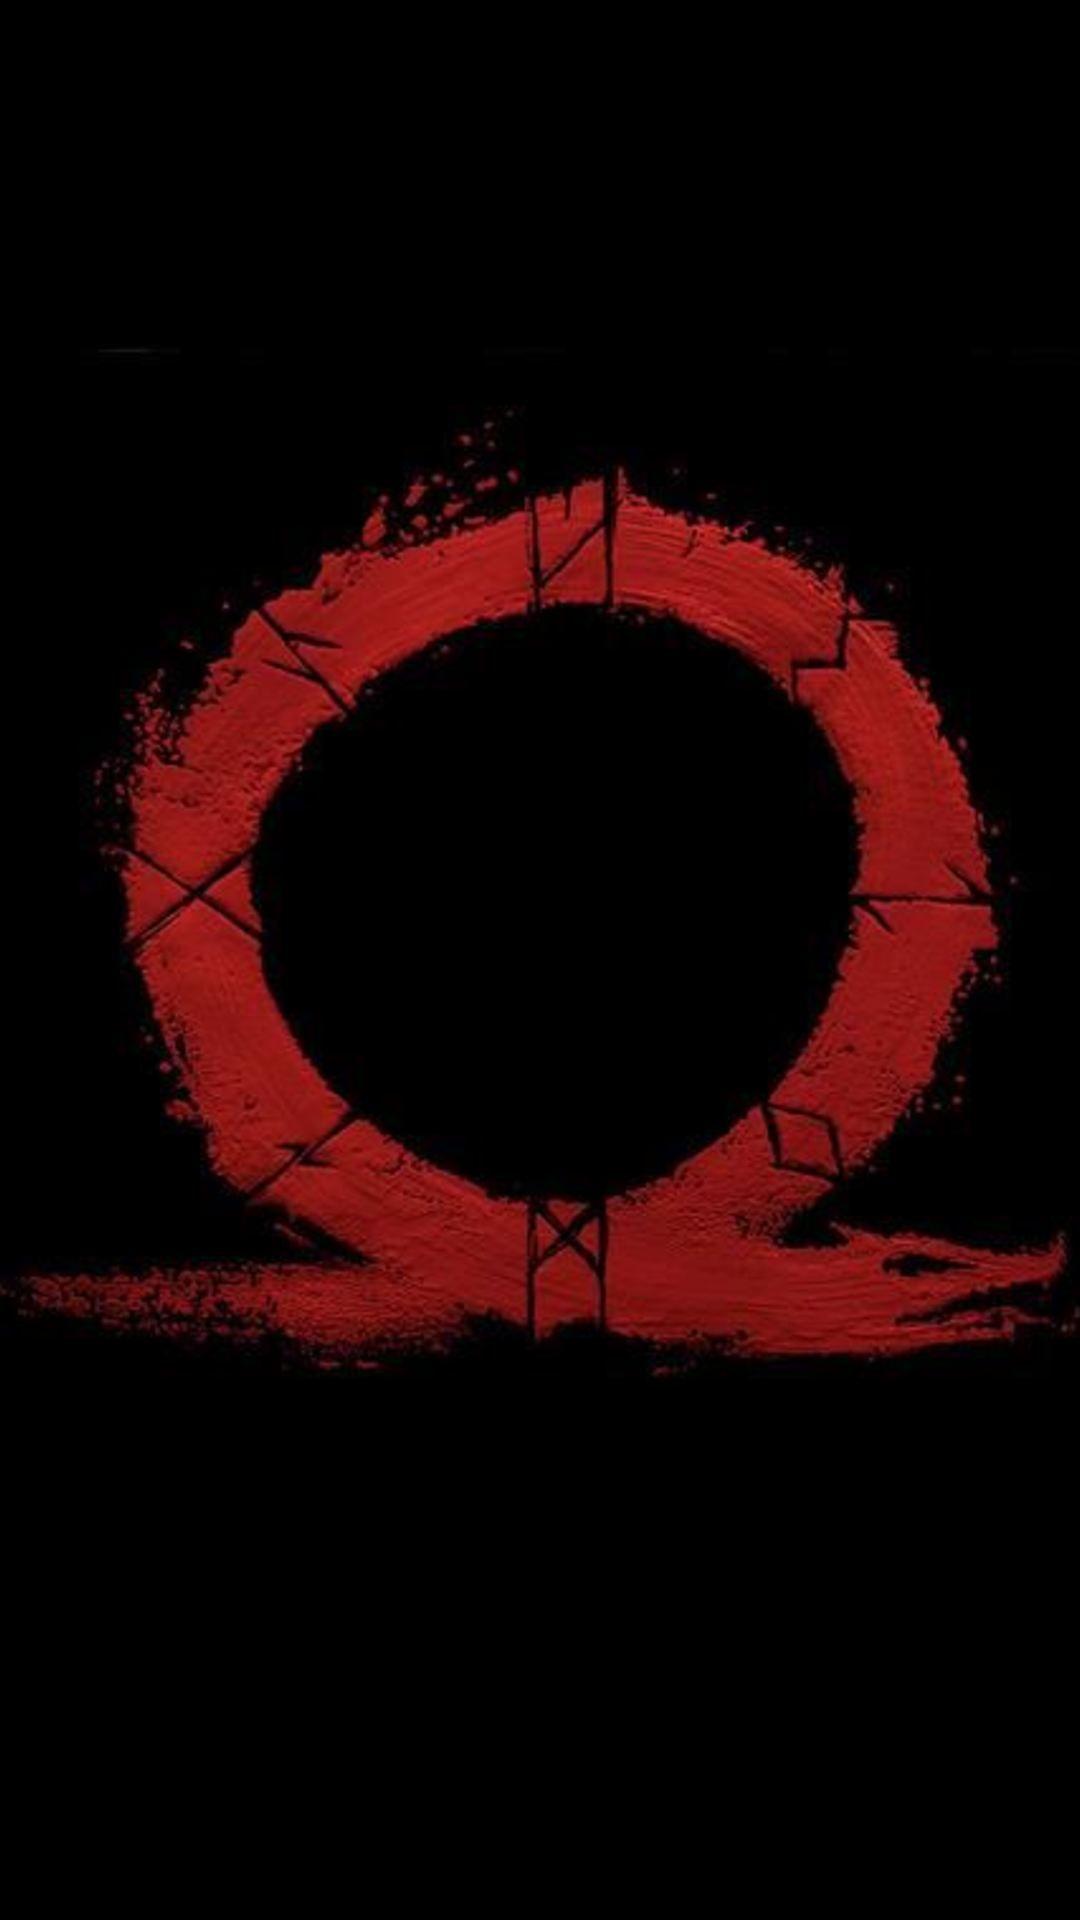 God Of War 4 New Omega Img Wallpaper 1080x1920 Kratos God Of War Papel De Parede Do Iphone Wallpaper J7